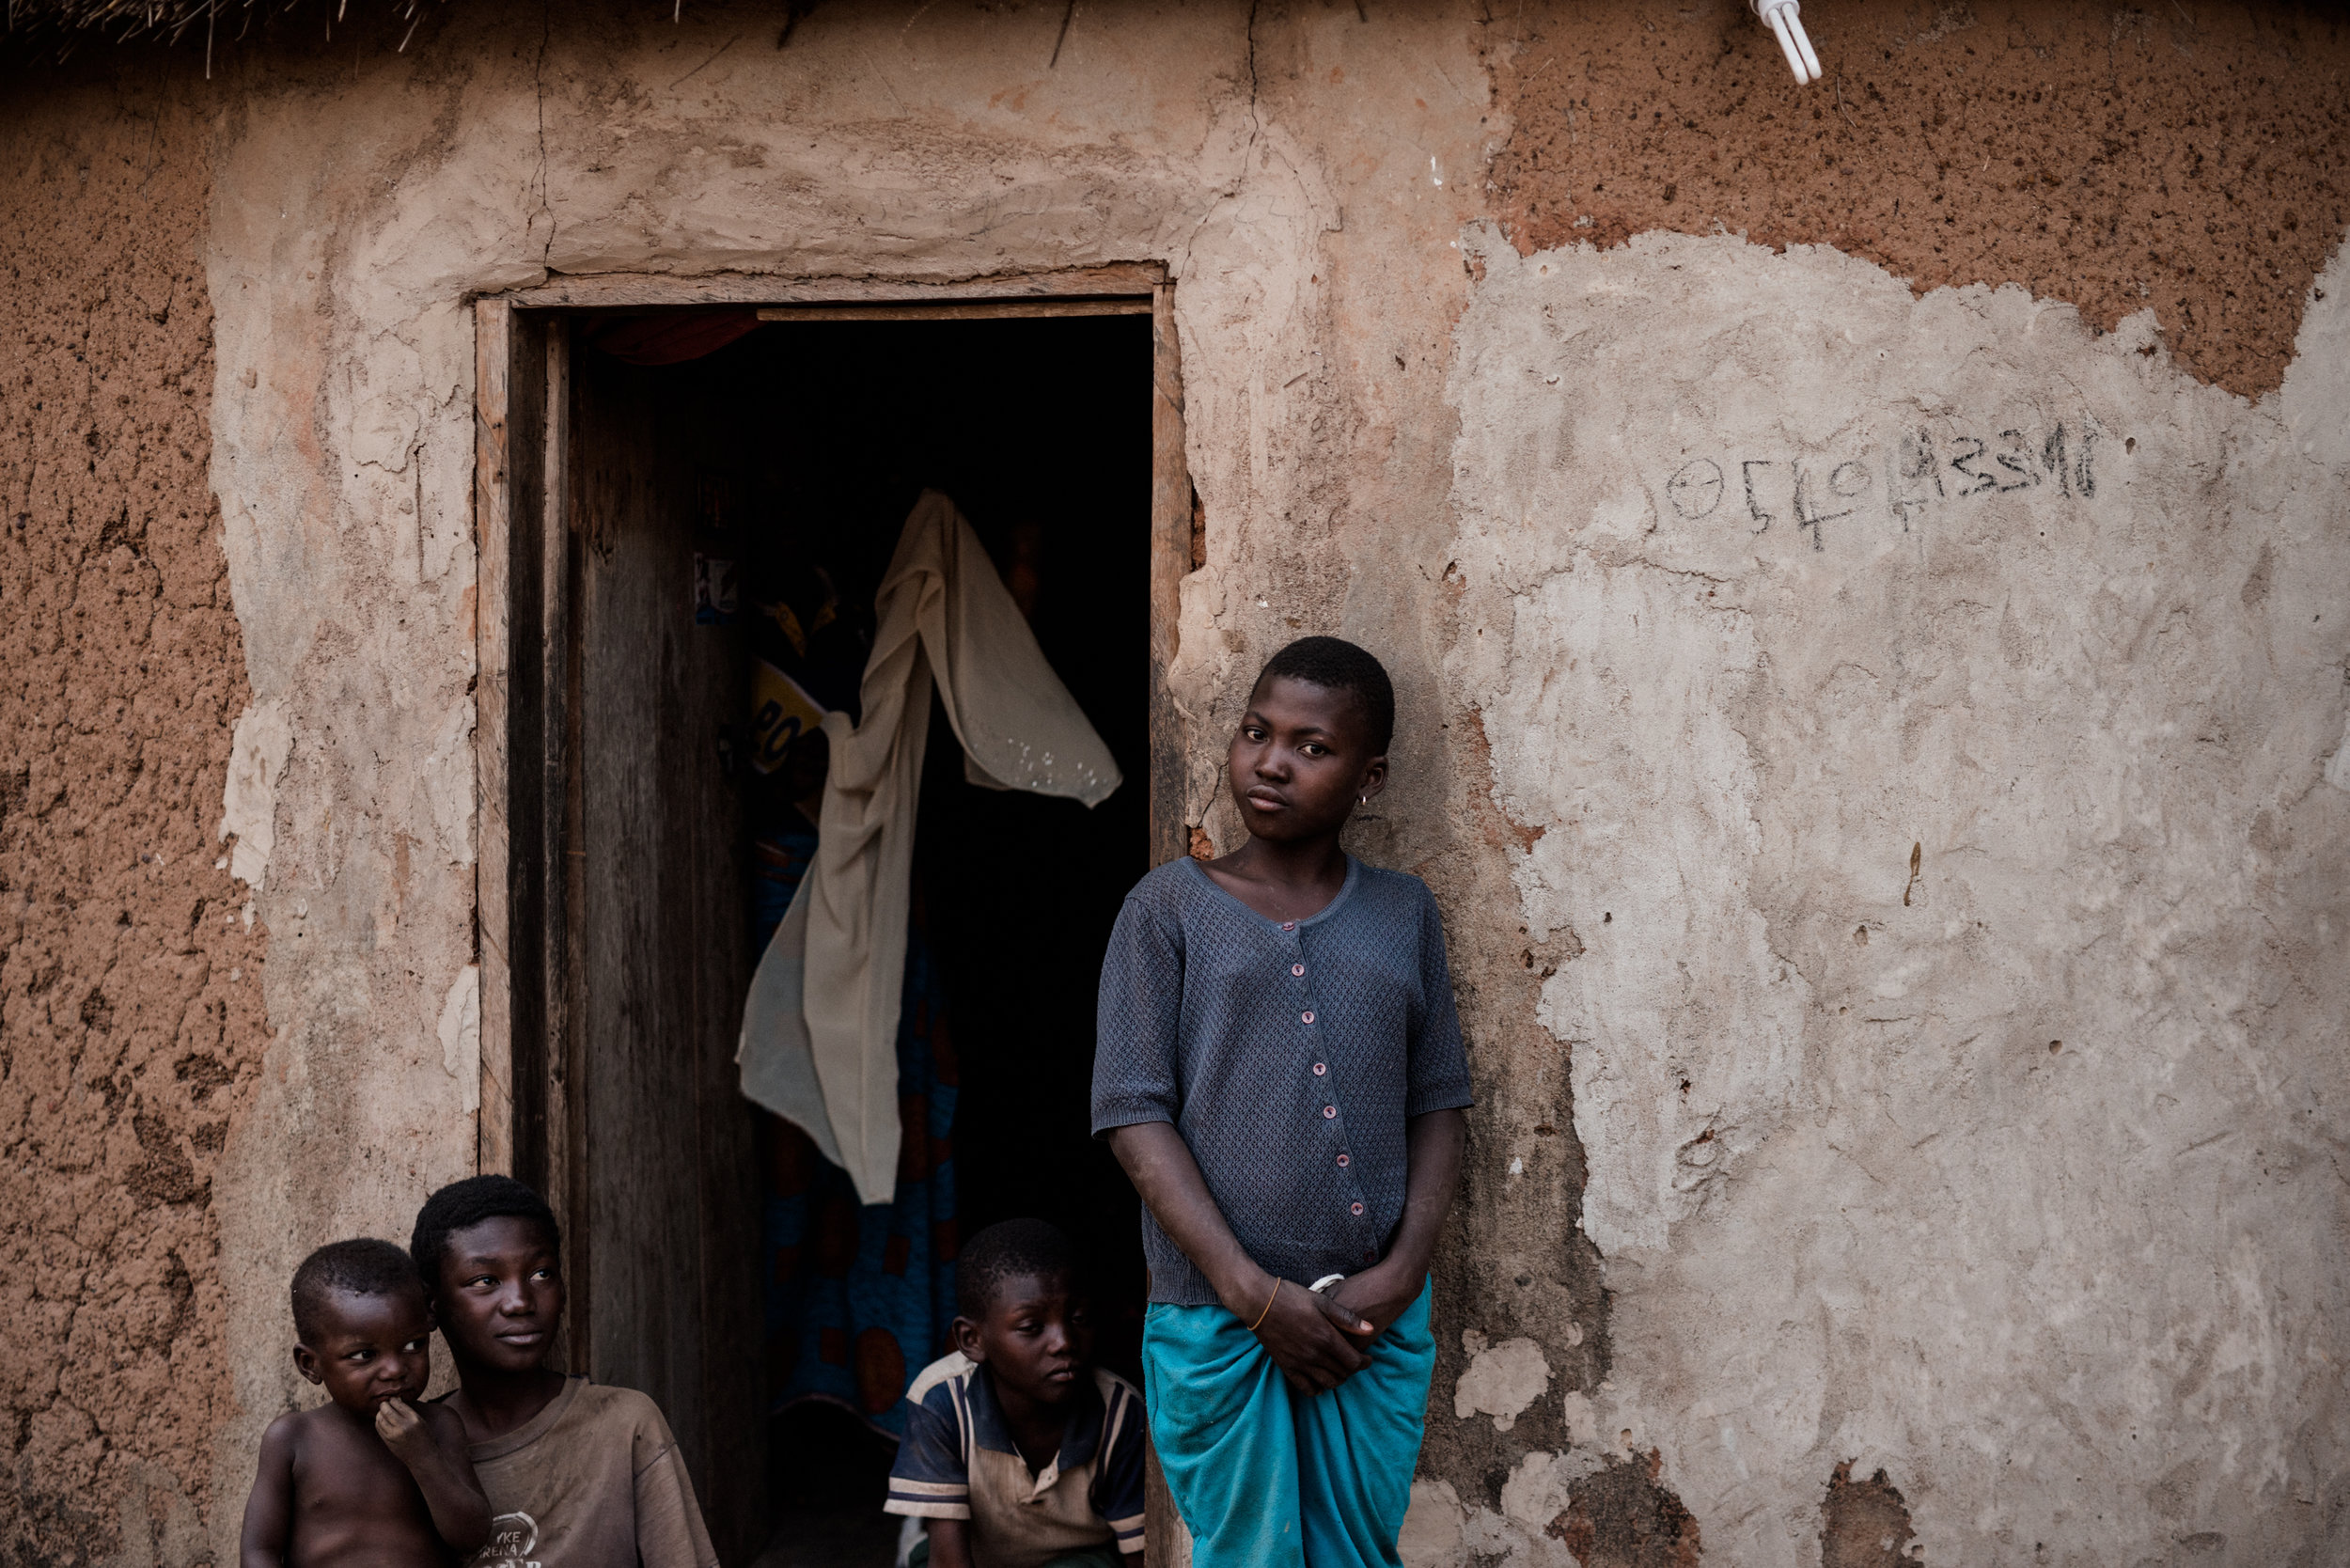 TaraShupe_HumanitarianPhotographer_Woman_Photographer_National_Geographic_Ghana_Women_035.jpg